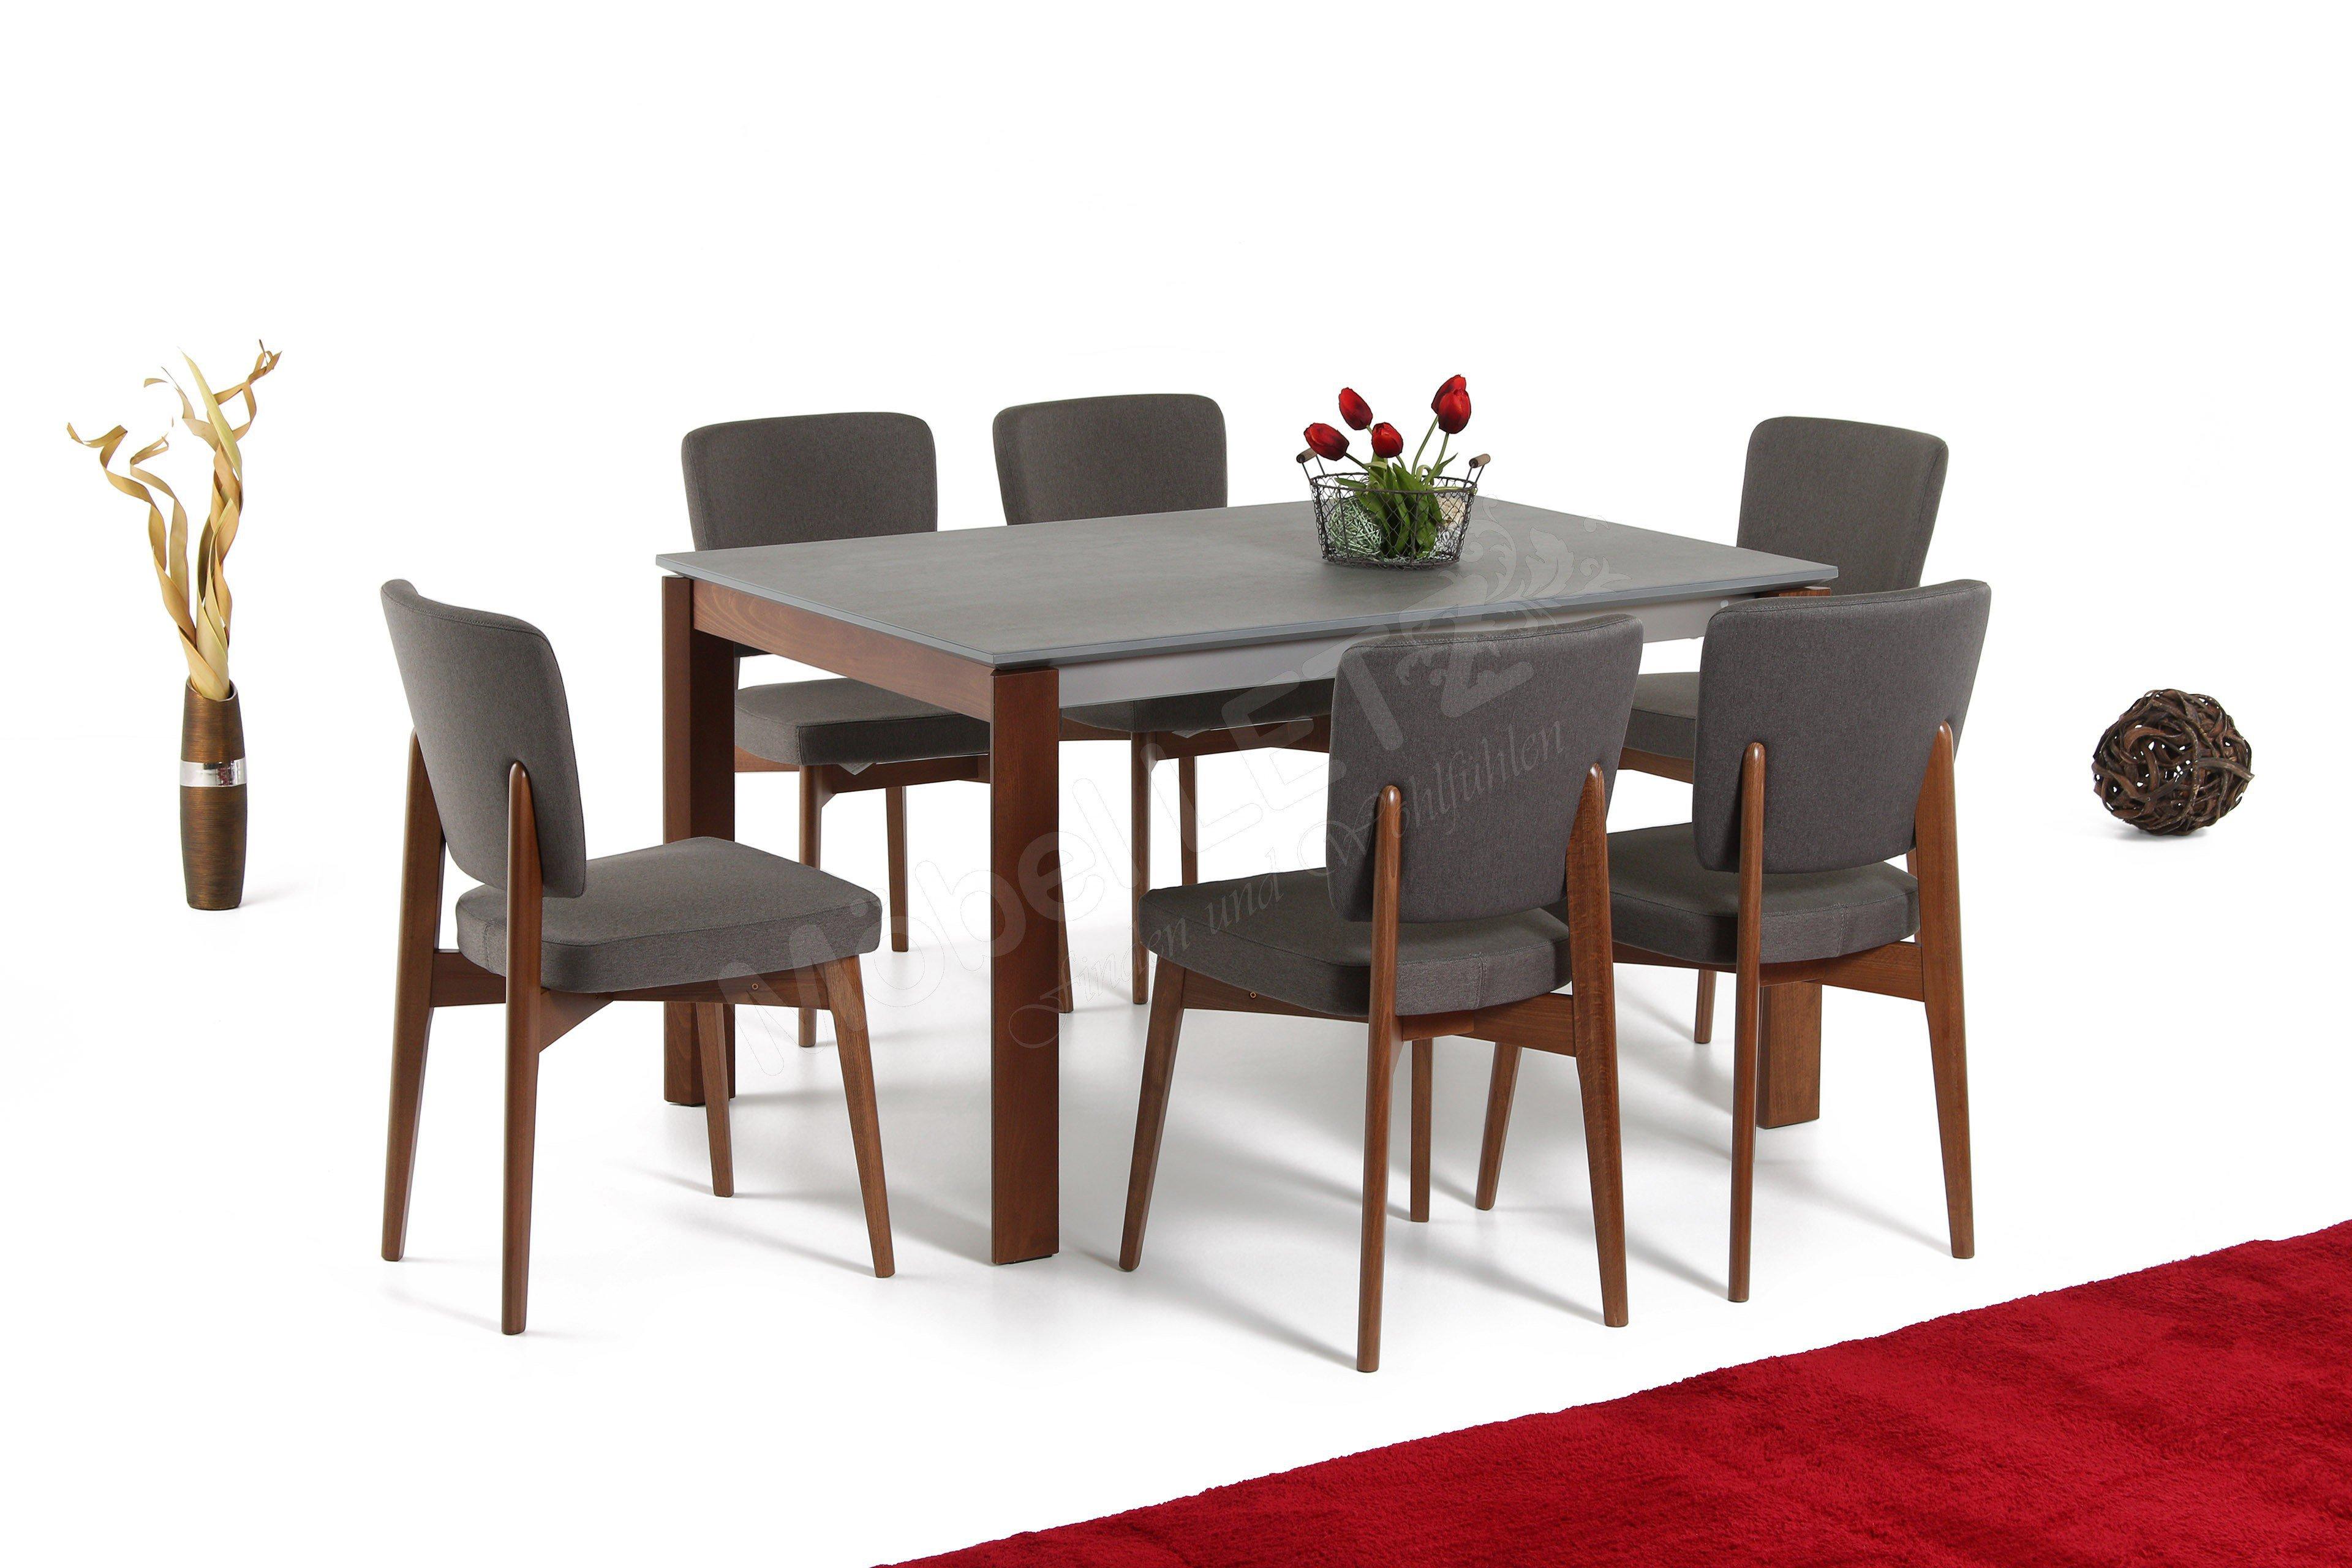 connubia by calligaris esstisch eminence keramik zement. Black Bedroom Furniture Sets. Home Design Ideas